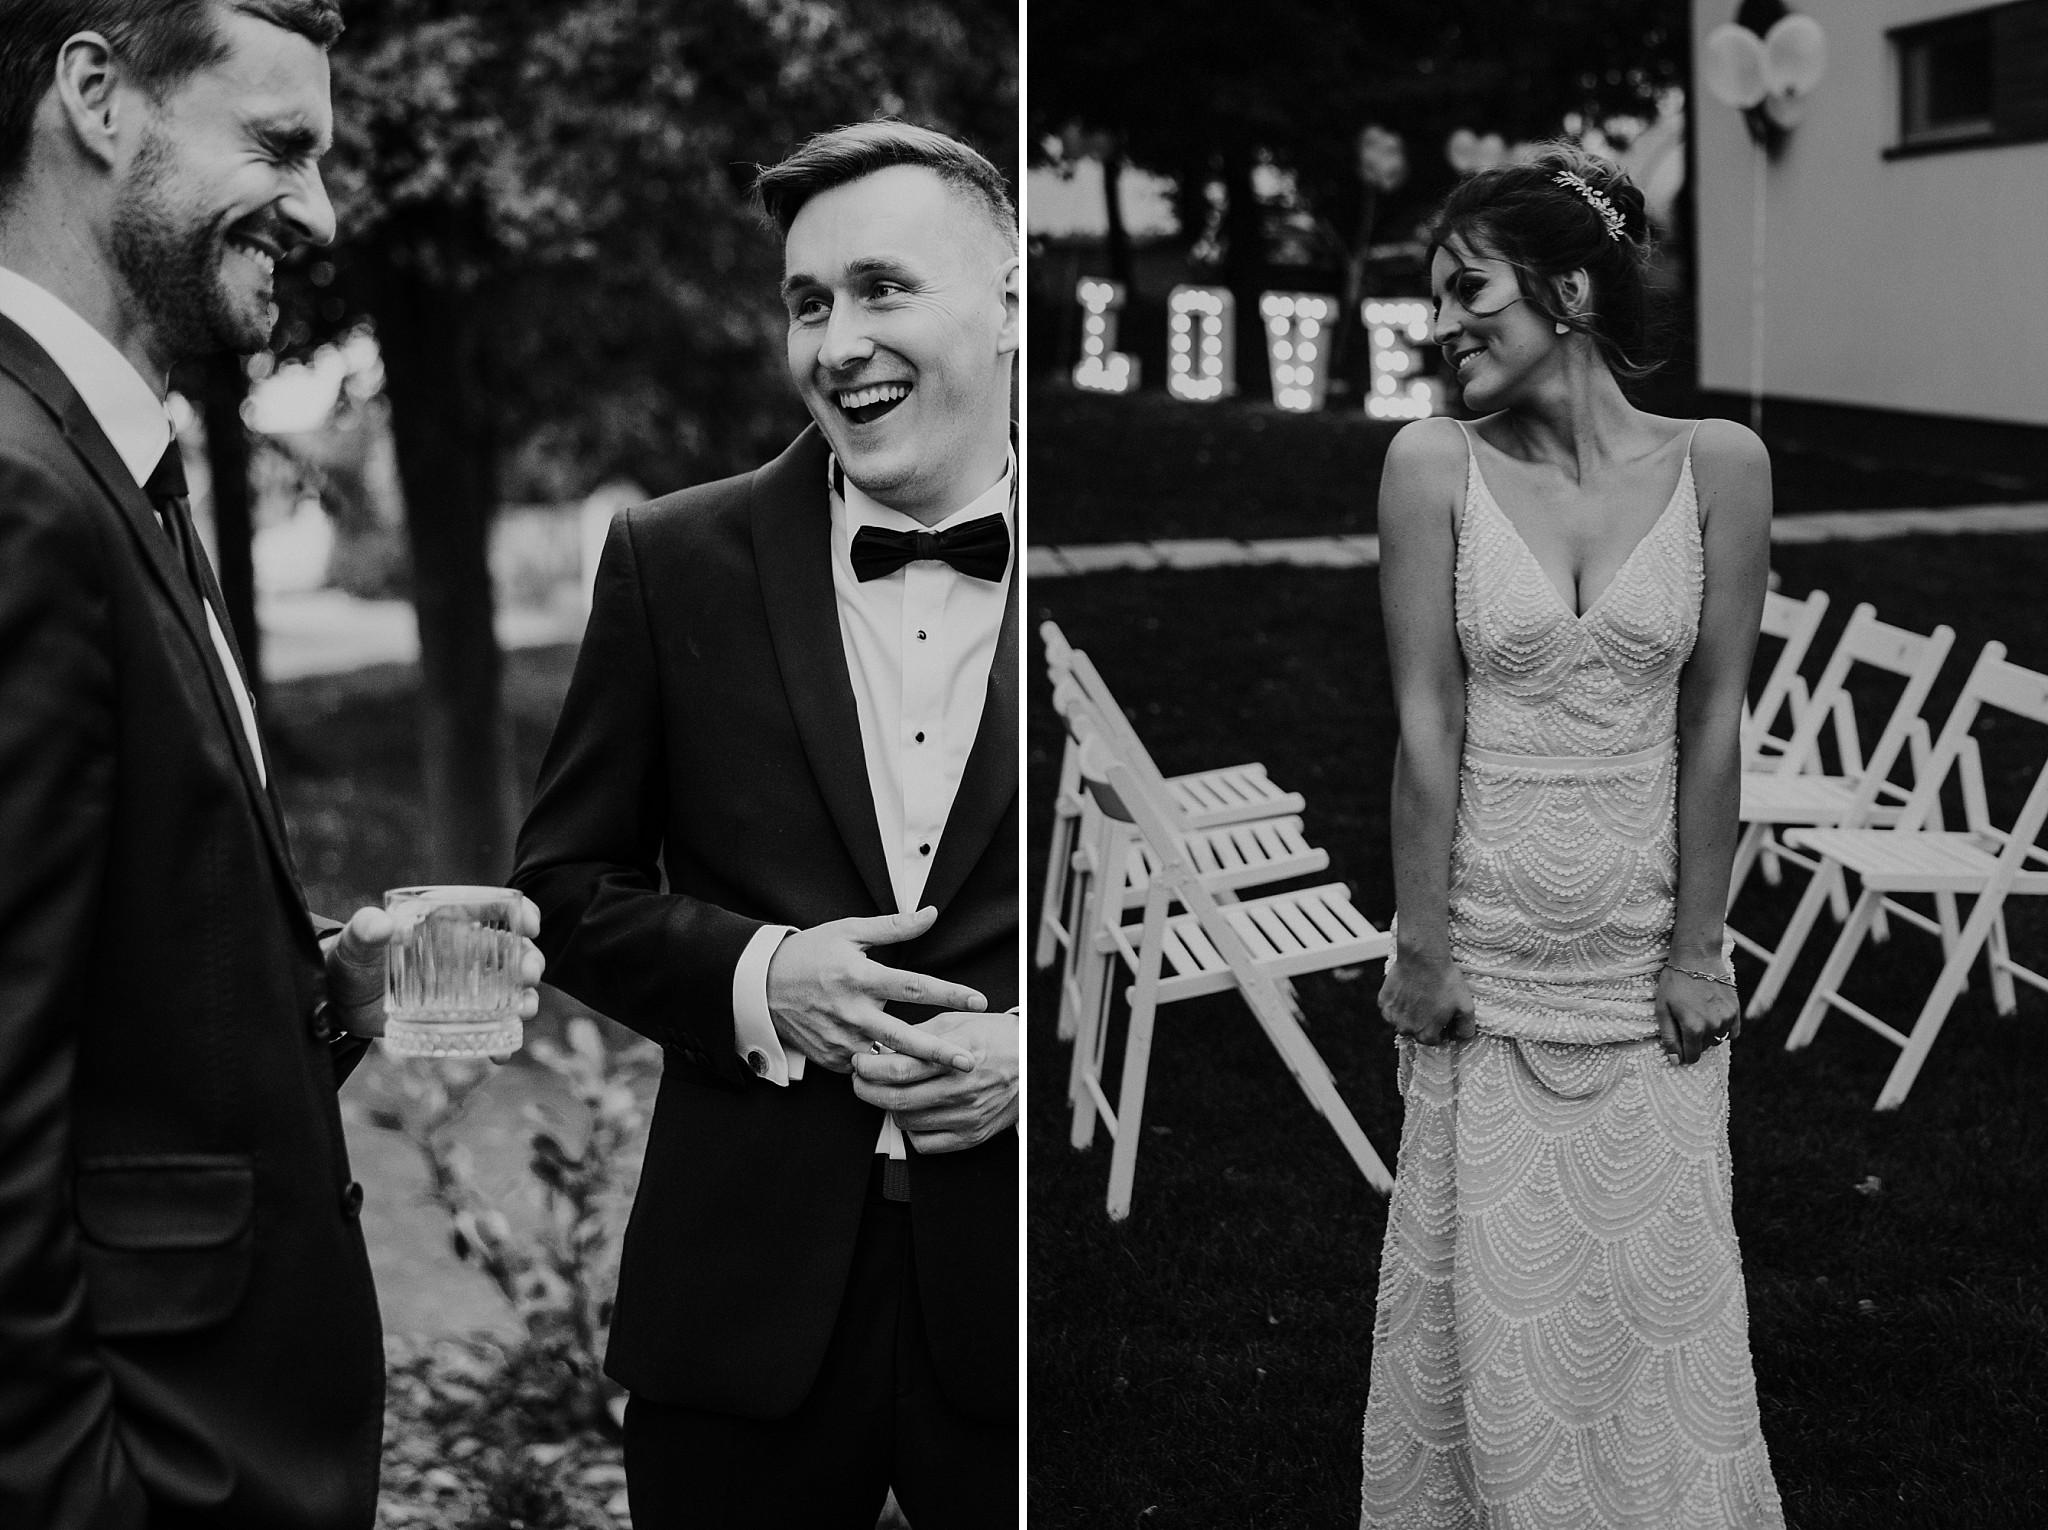 fotograf poznan wesele dobra truskawka piekne wesele pod poznaniem wesele w dobrej truskawce piekna para mloda slub marzen slub koronawirus slub listopad wesele koronawirus 333